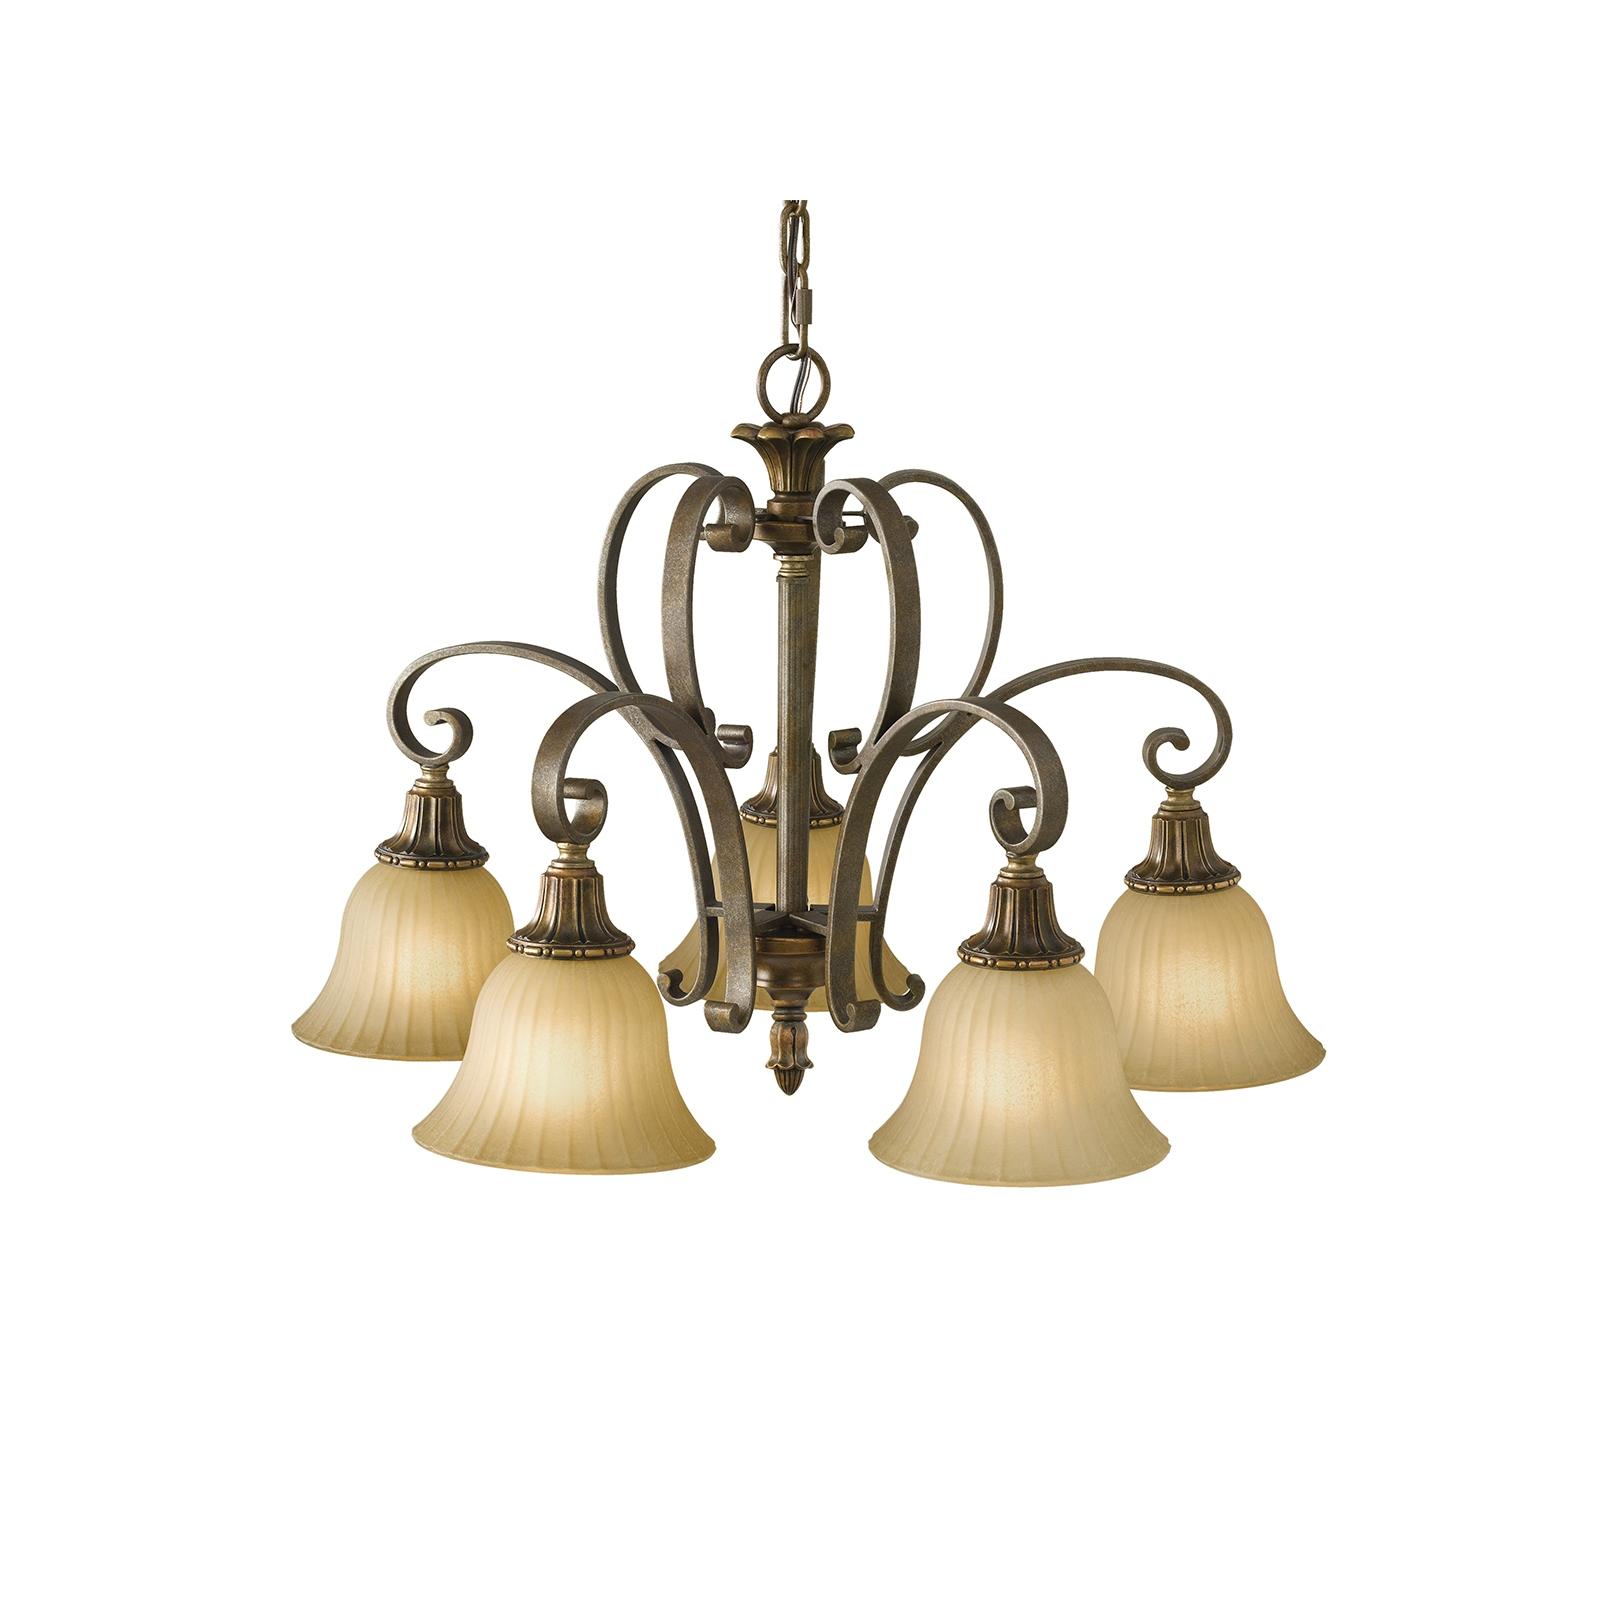 Kelham hall 5 light down chandelier